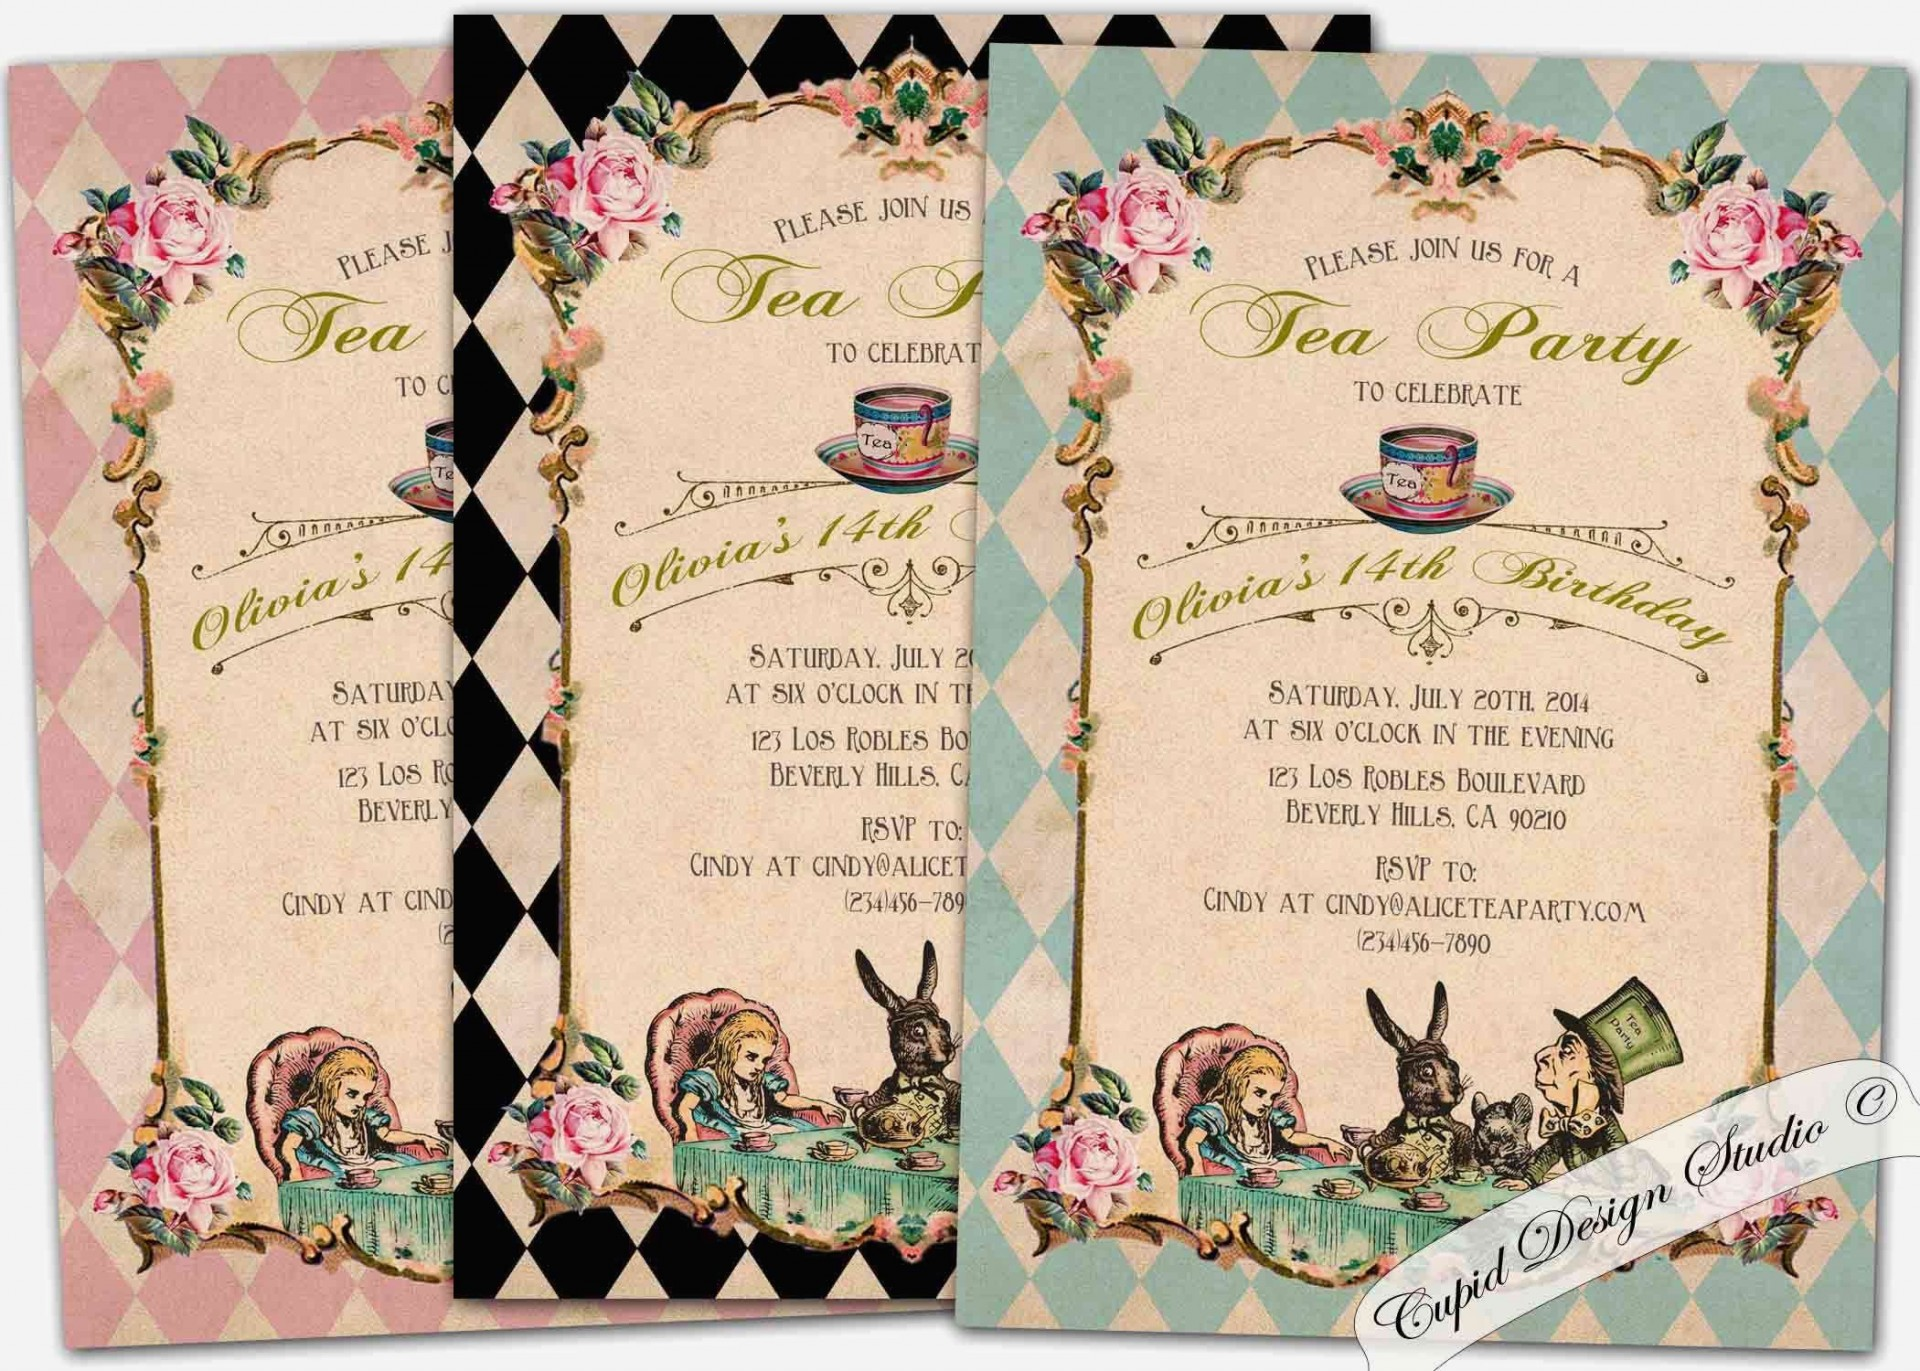 010 Unbelievable Alice In Wonderland Invite Template Design  Party Invitation Free1920